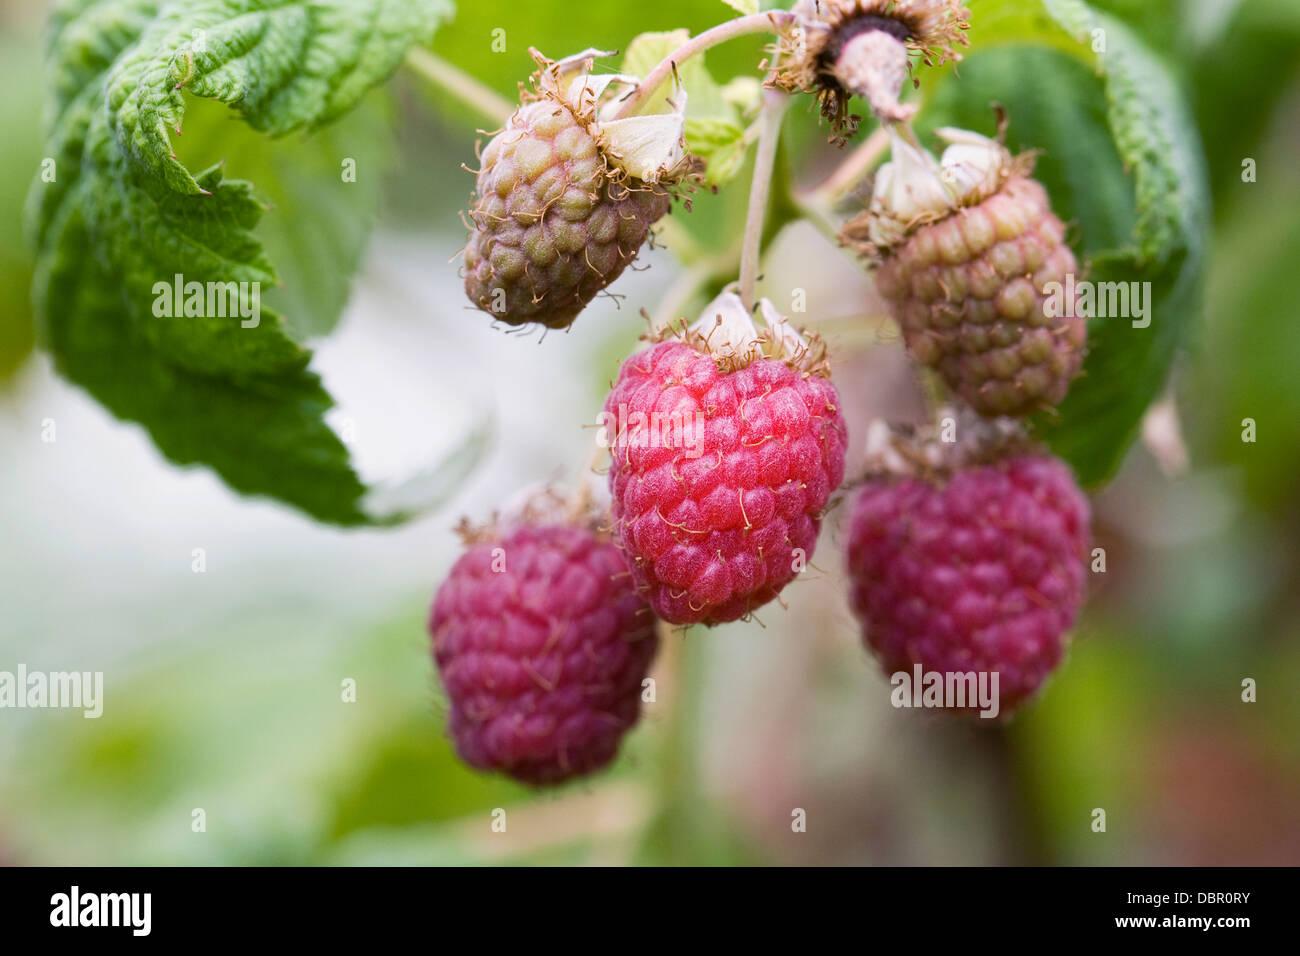 Rubus. Raspberry 'Malling Jewel' growing in a fruit garden. - Stock Image